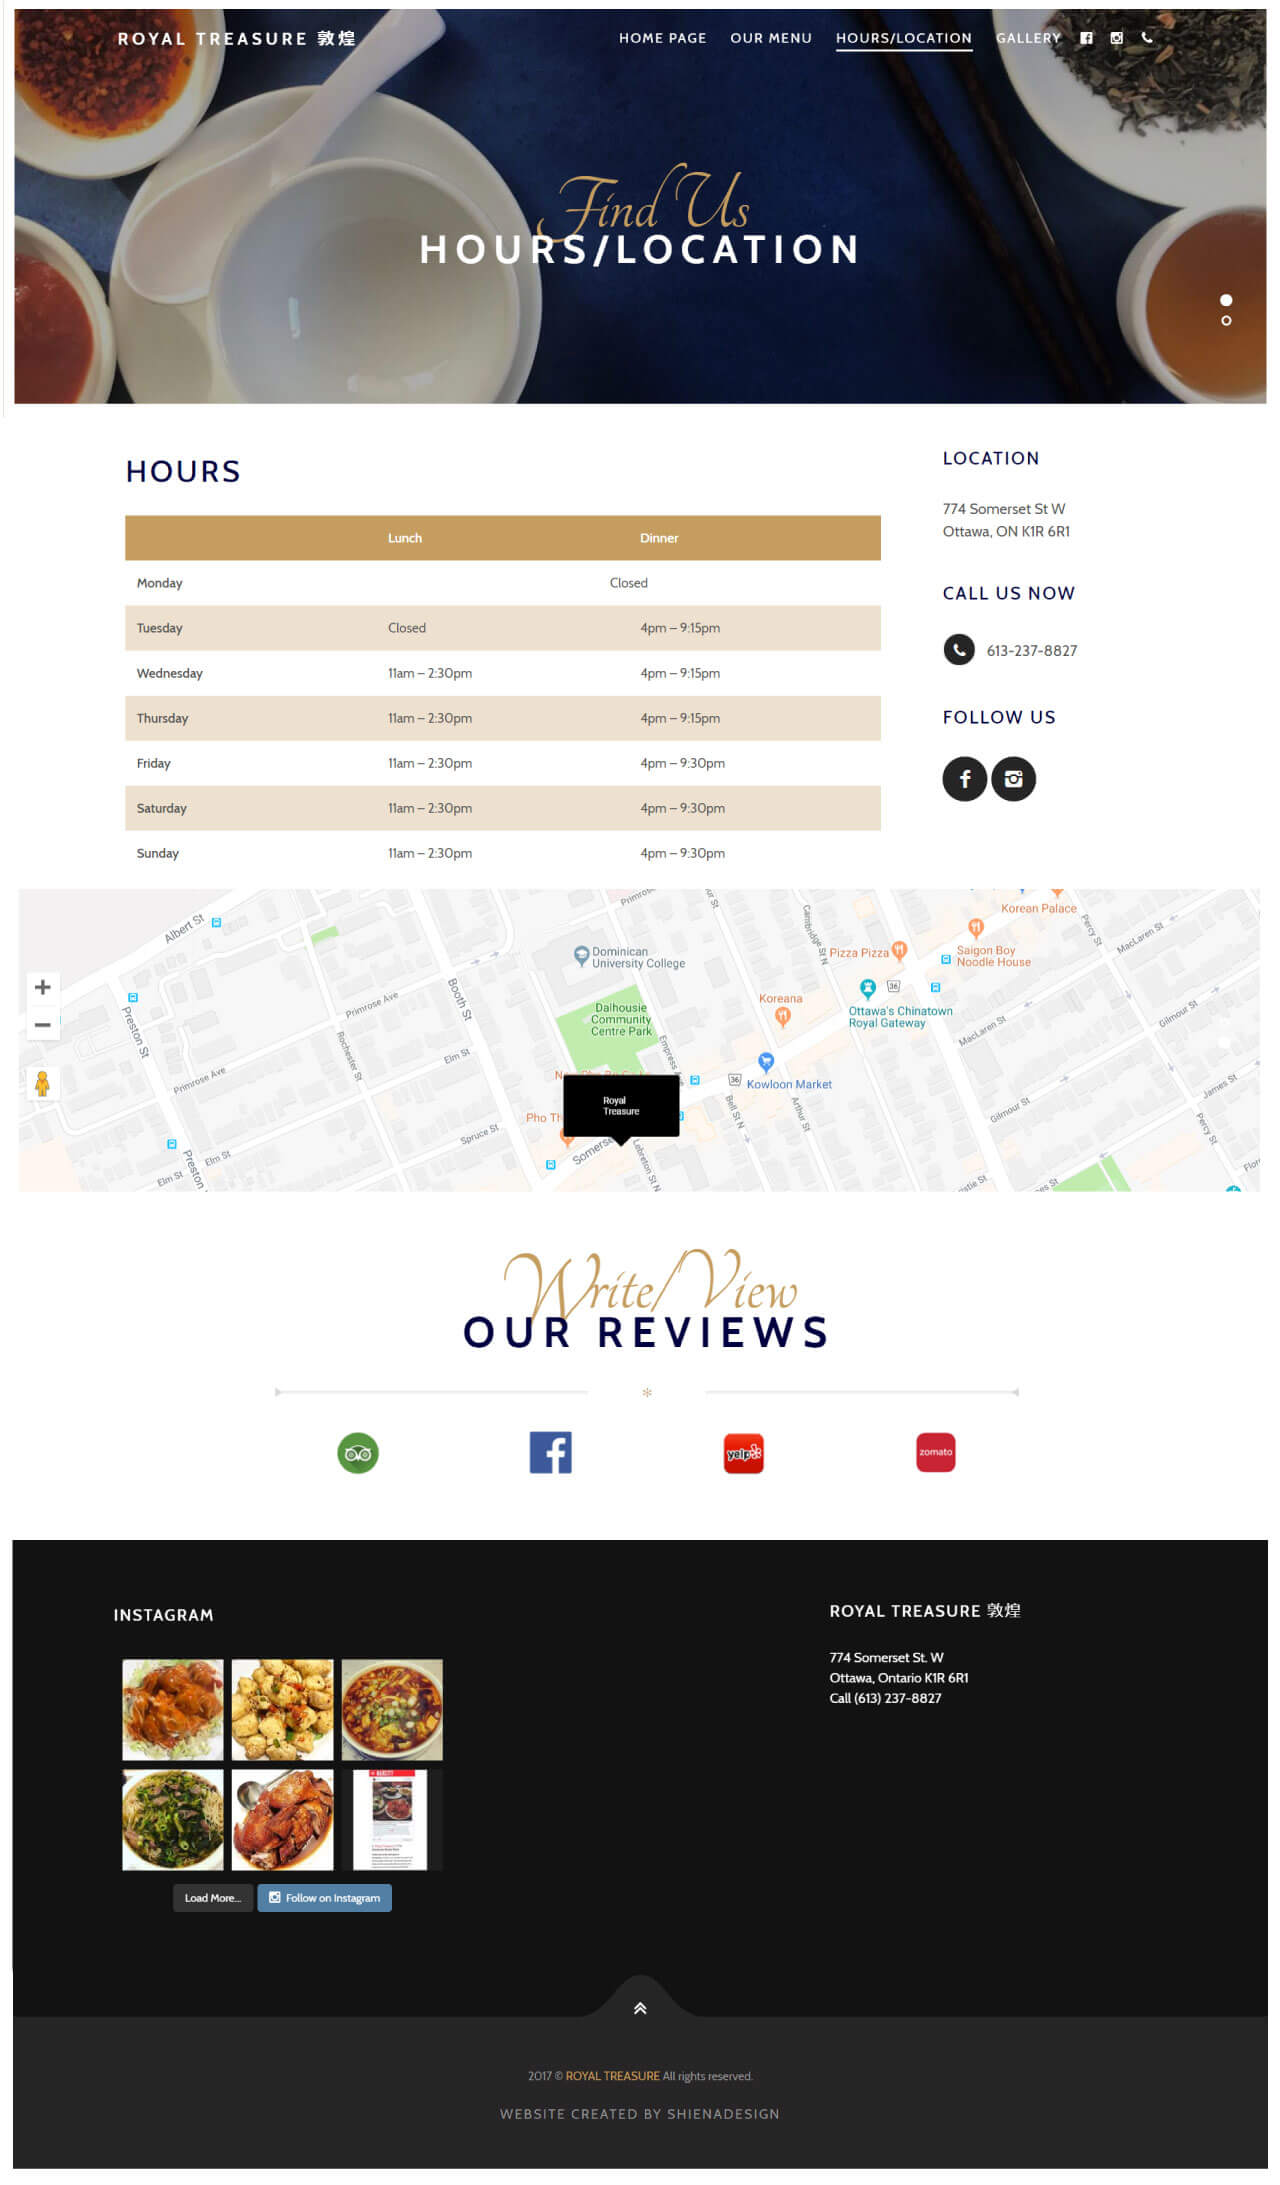 Royal Treasure restaurant location & hours section demo